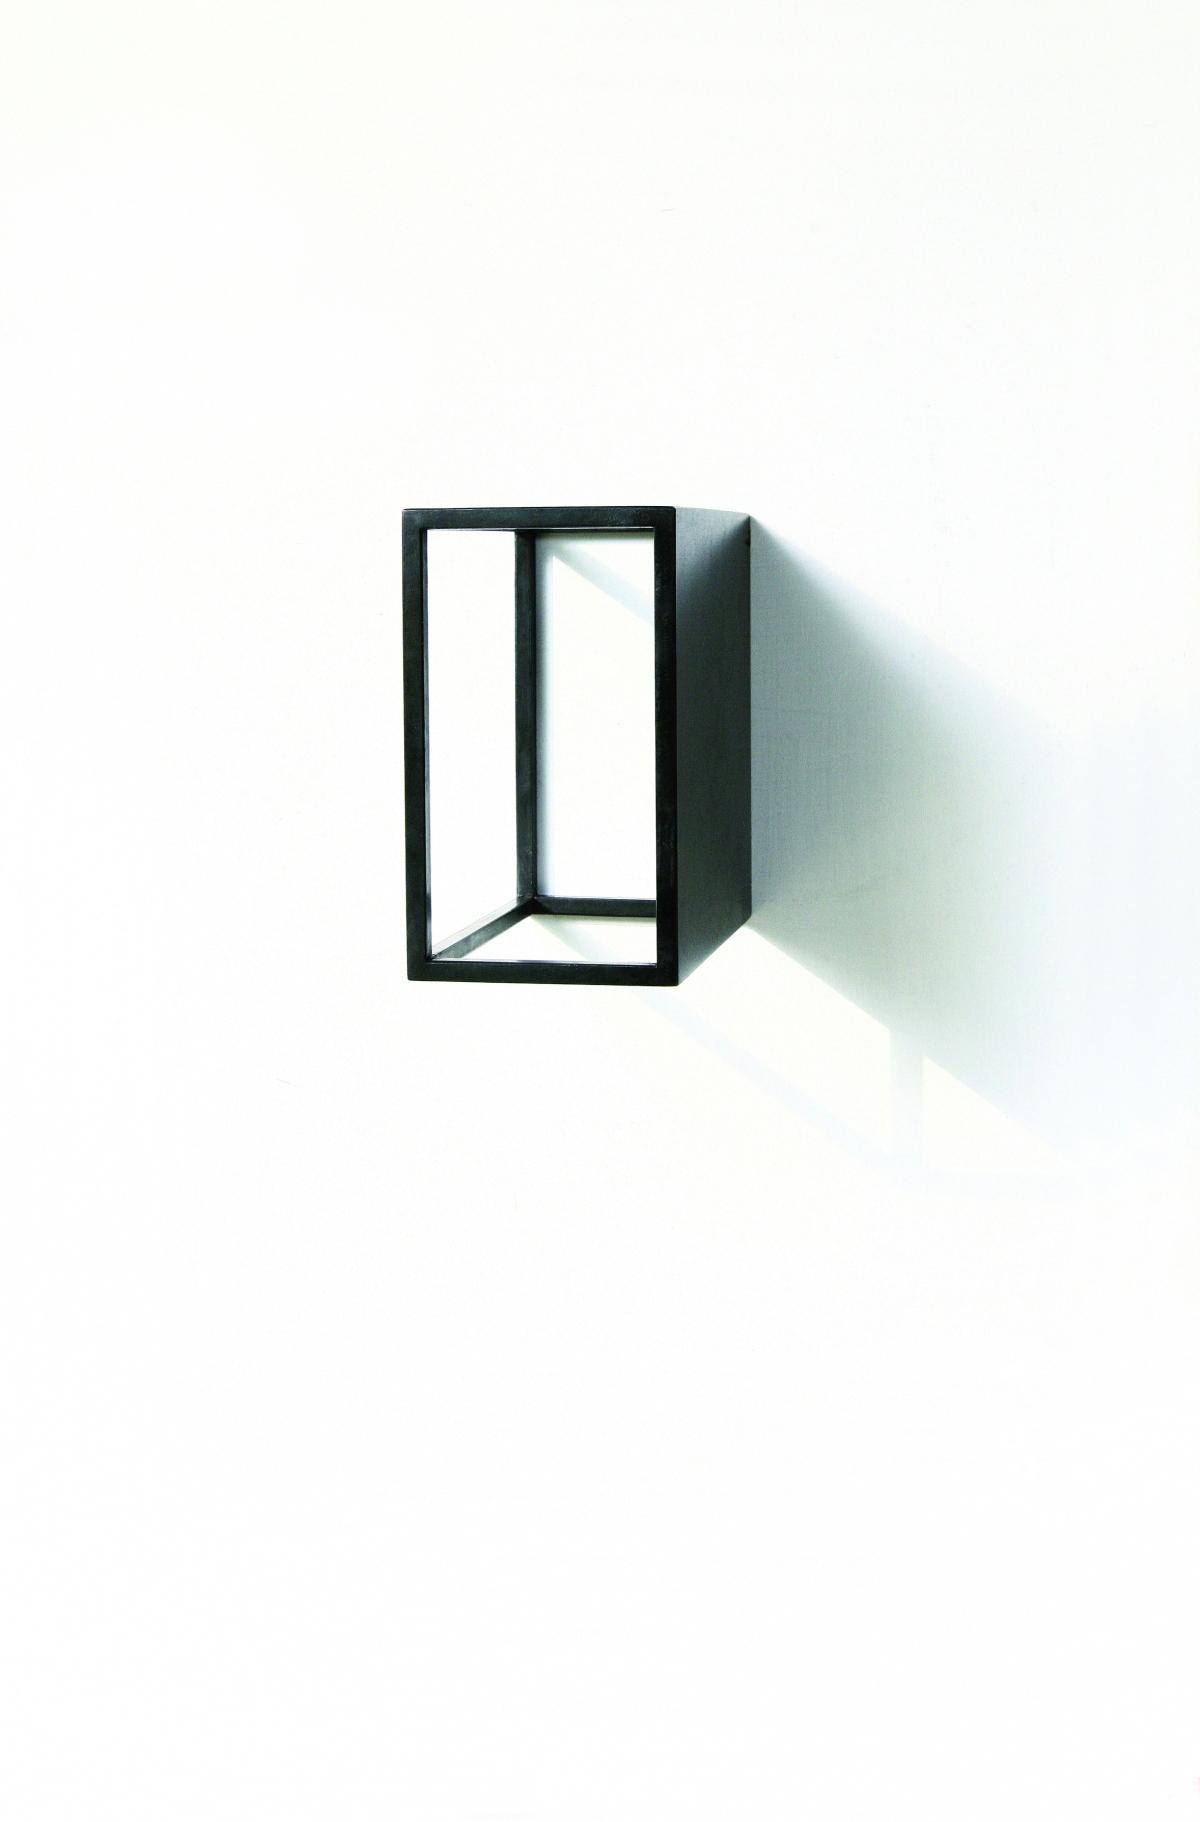 #46 Riki Mijling, Resonance Shape-Q, 2010, gebrand staal, 13x7,6x13 cm